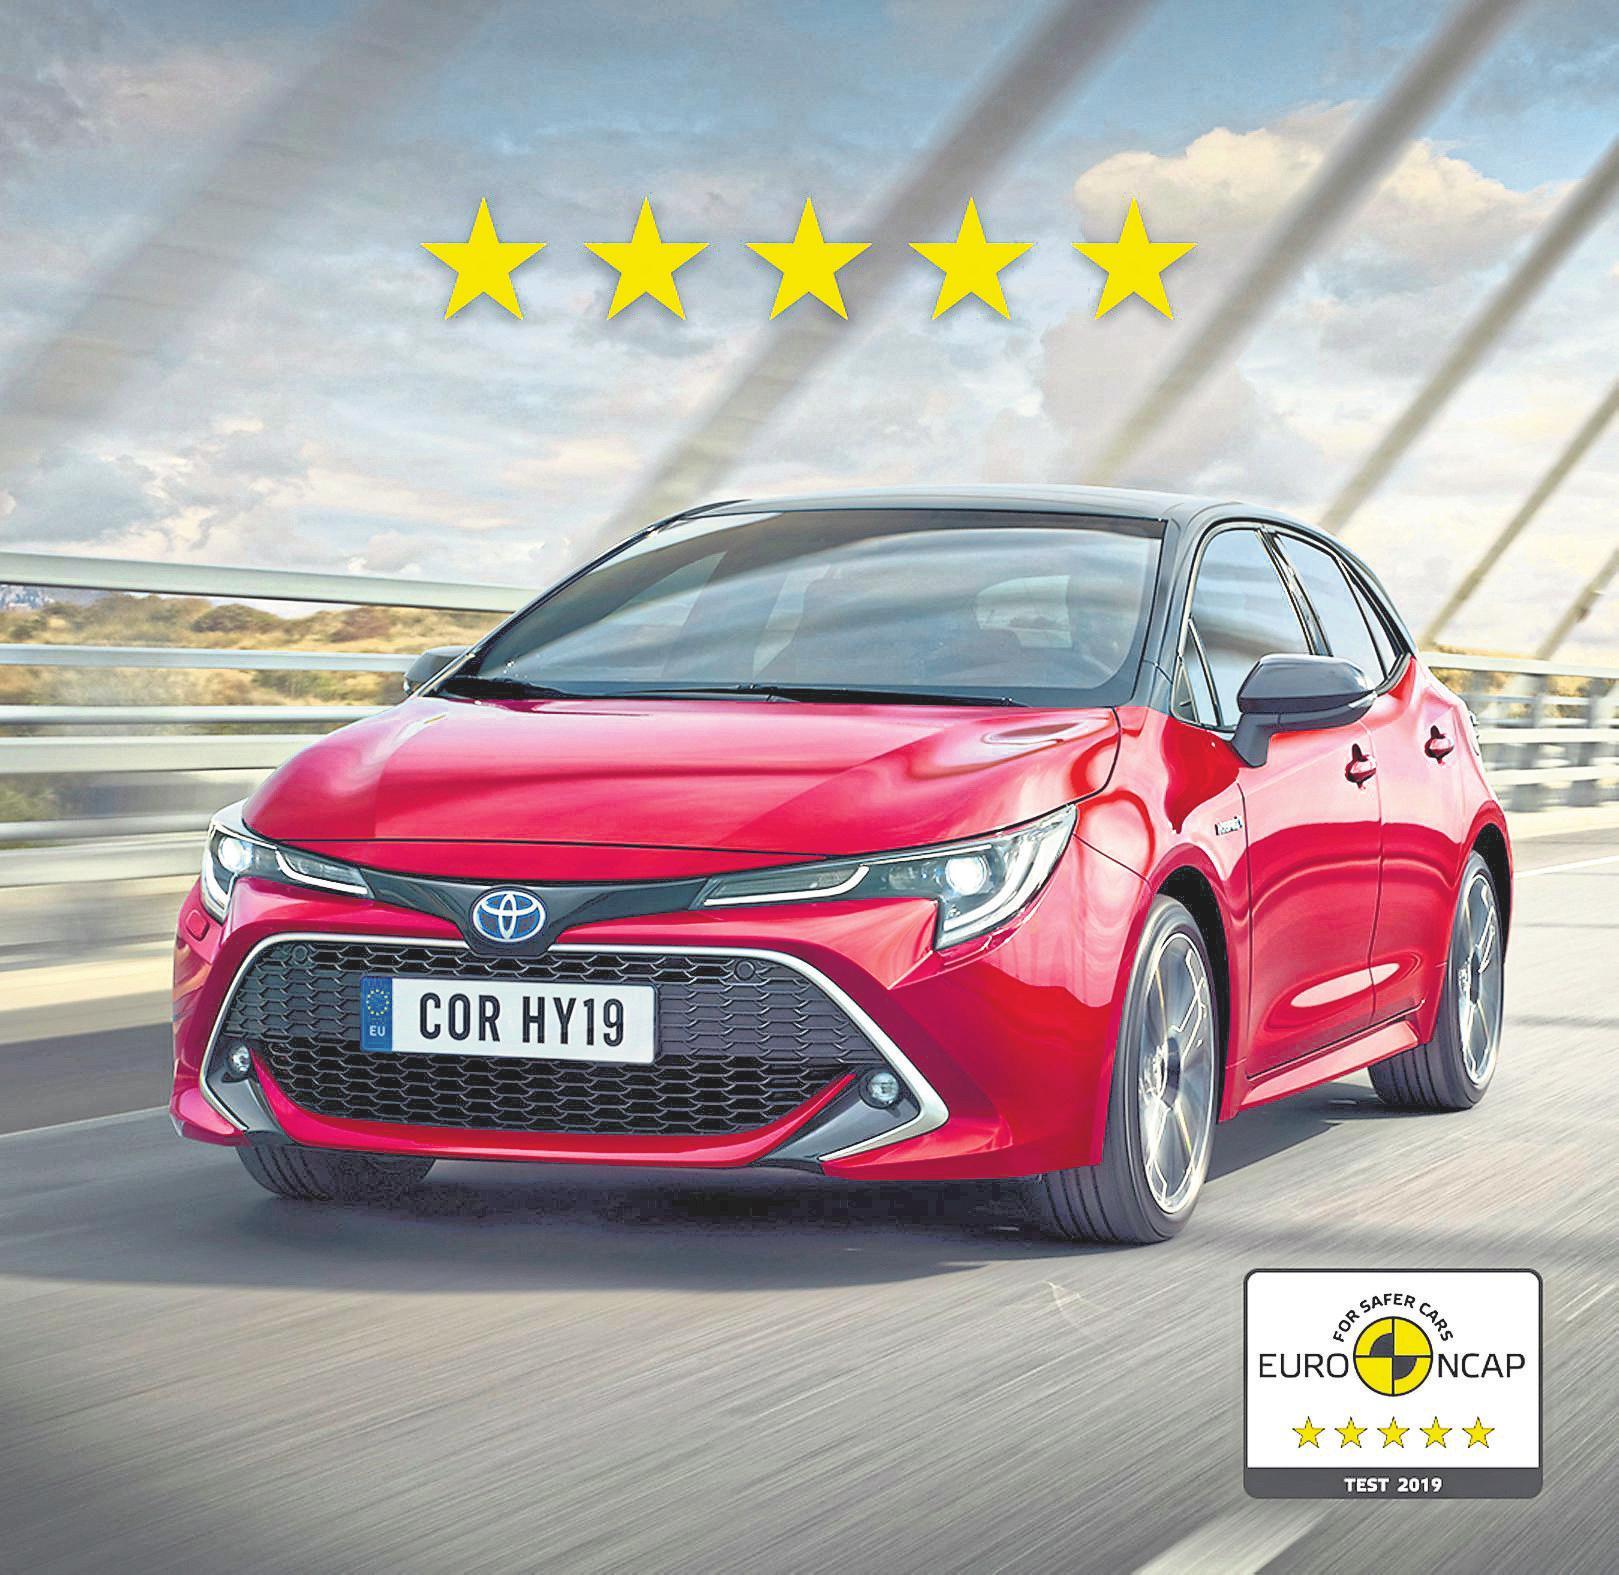 Der Toyota Corolla erhielt 2019 fünf Sterne im Euro NCAP Crashtest.